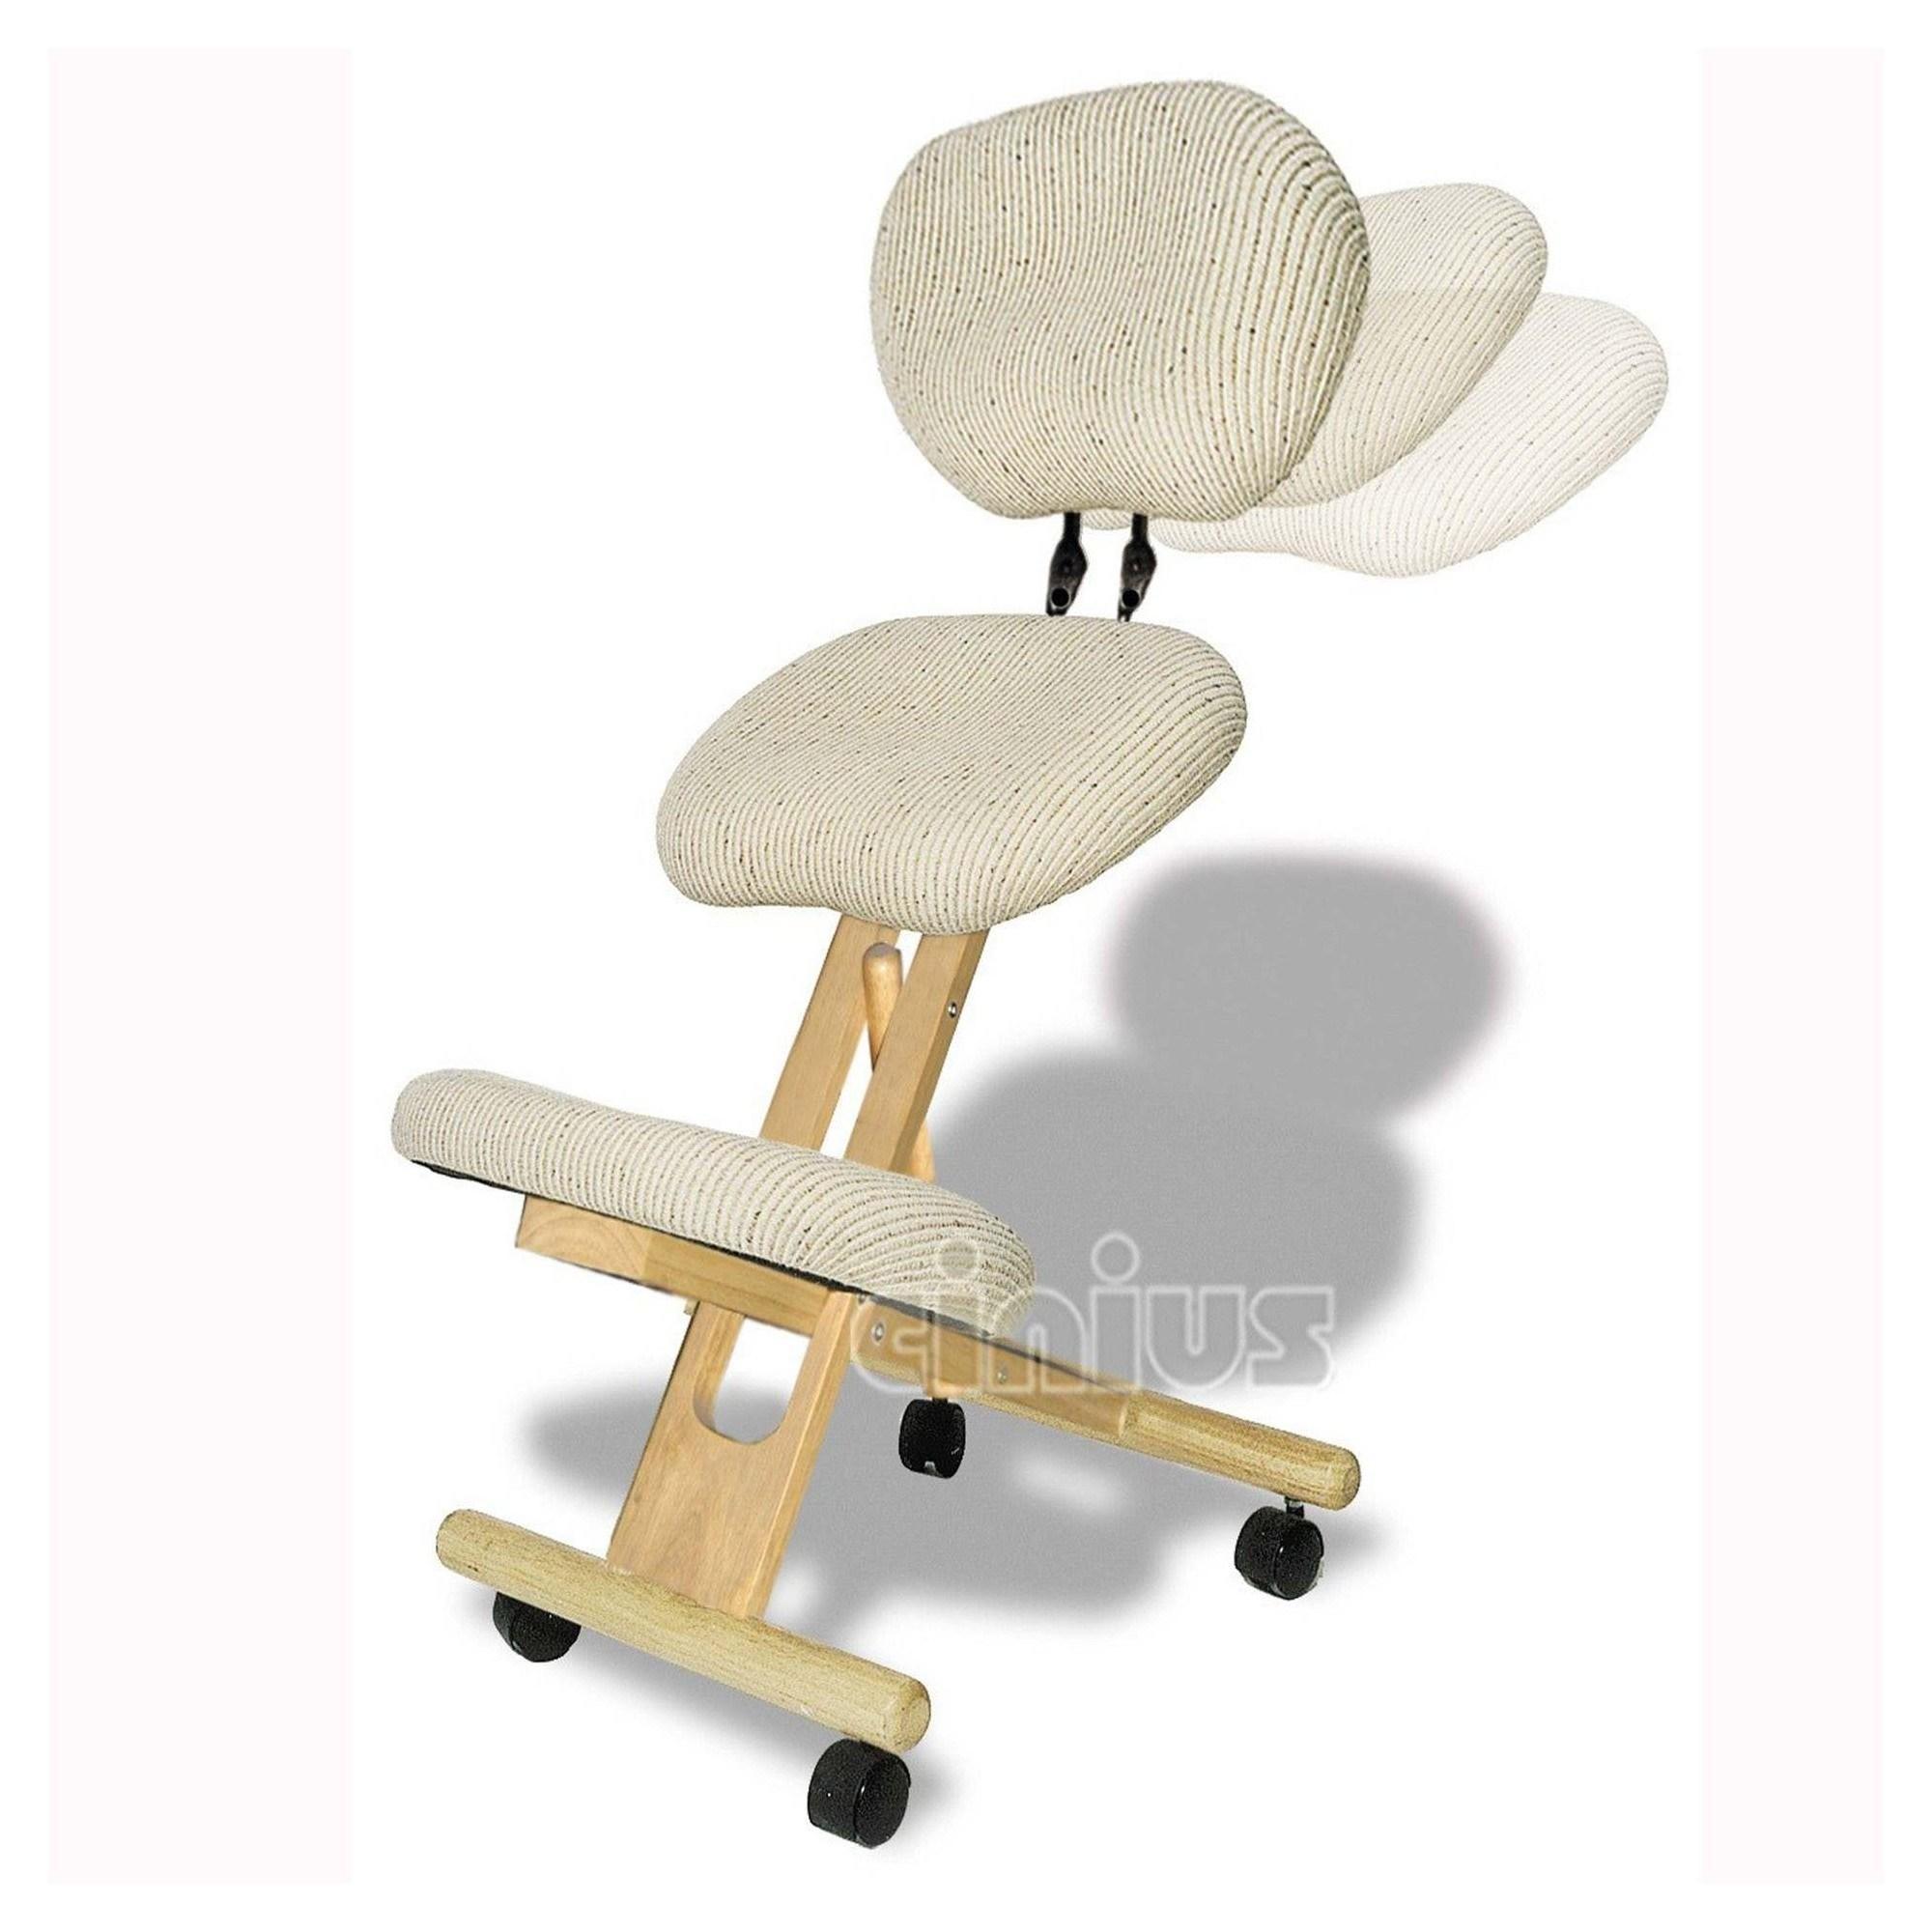 Ergonomic Sofas And Chairs | Retro Furniture Outlet Within Ergonomic Sofas And Chairs (View 20 of 20)